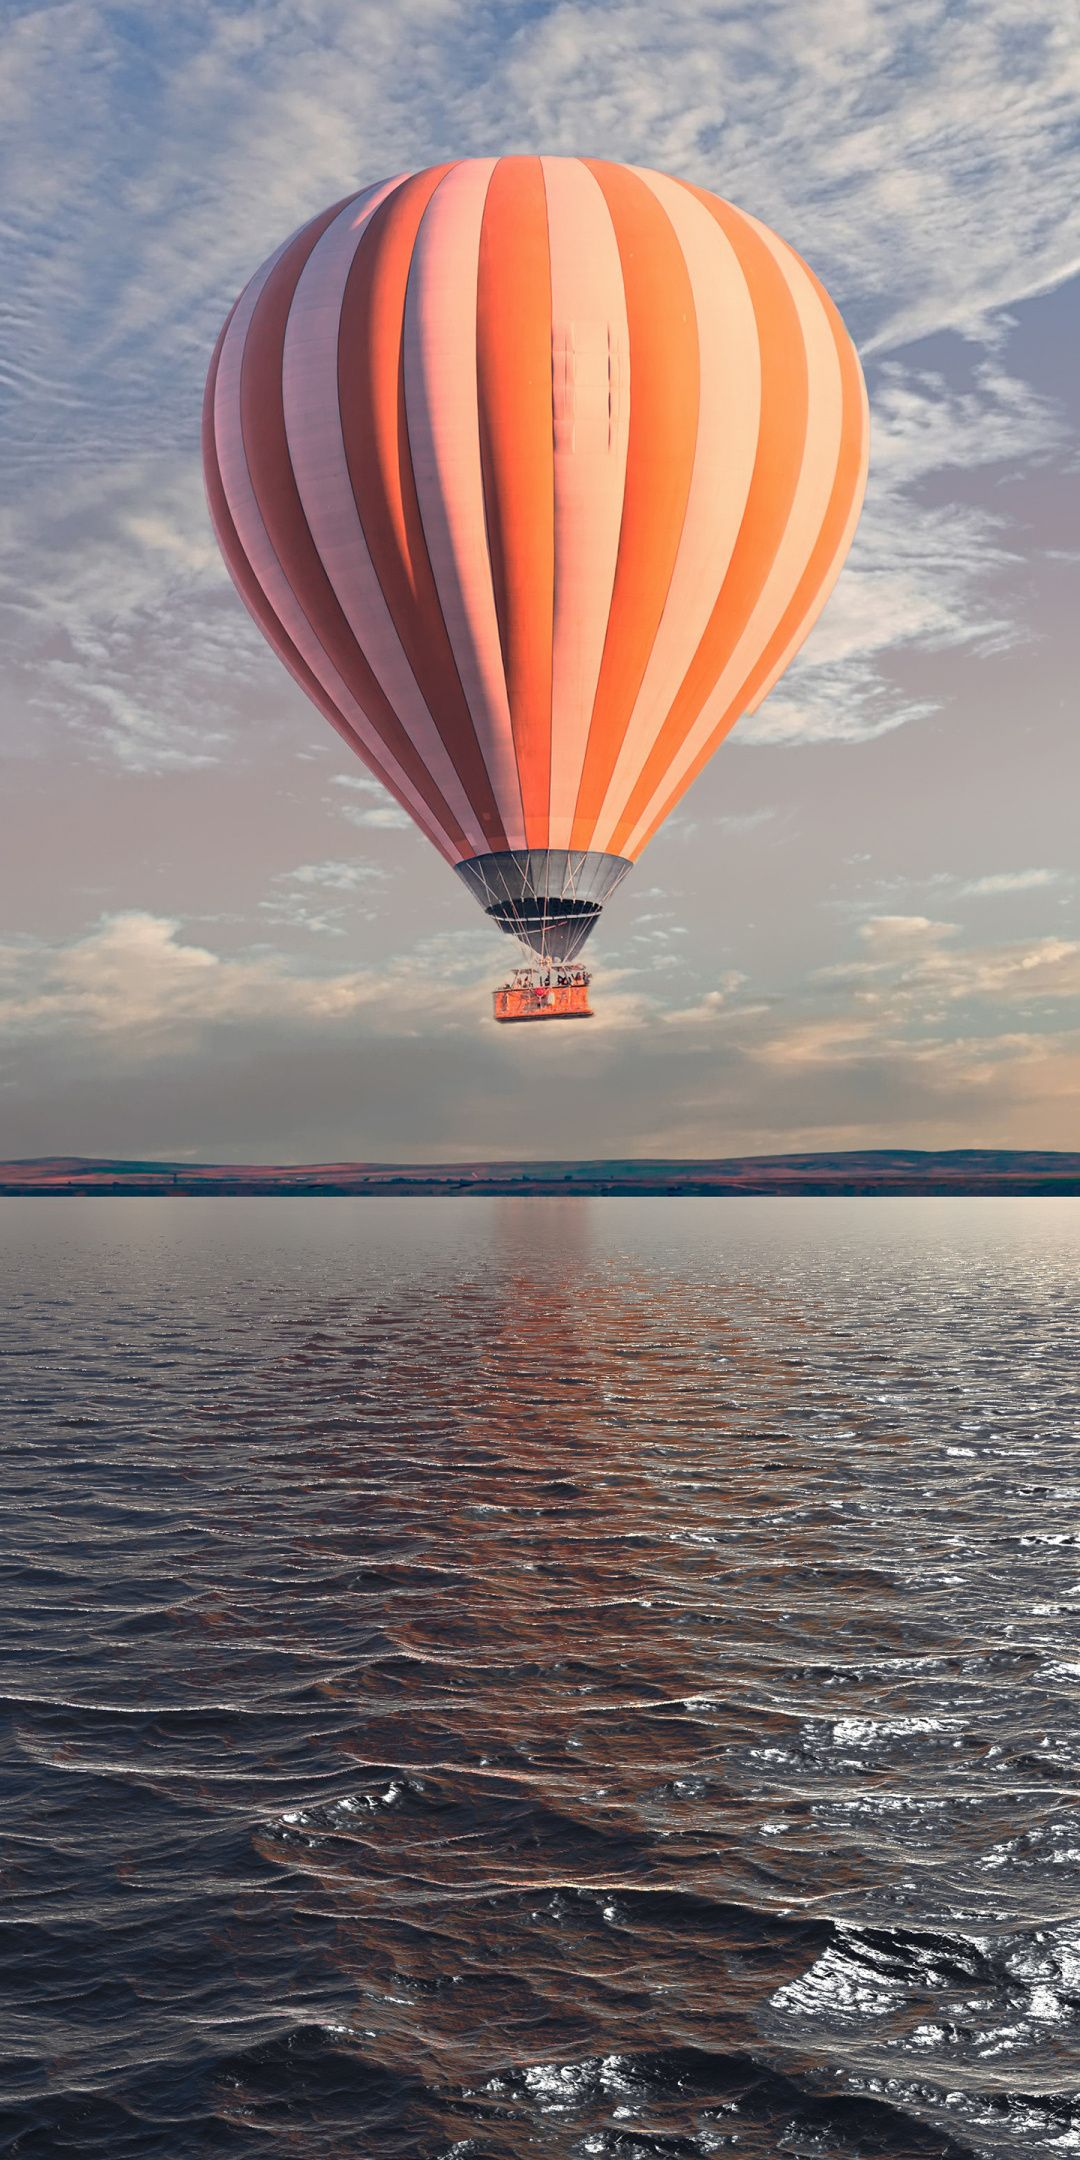 Hot Air Balloon Flight Over The Lake Body Of Water 1080x2160 Wallpaper Chat Wallpaper Whatsapp Scenery Wallpaper Hd Landscape